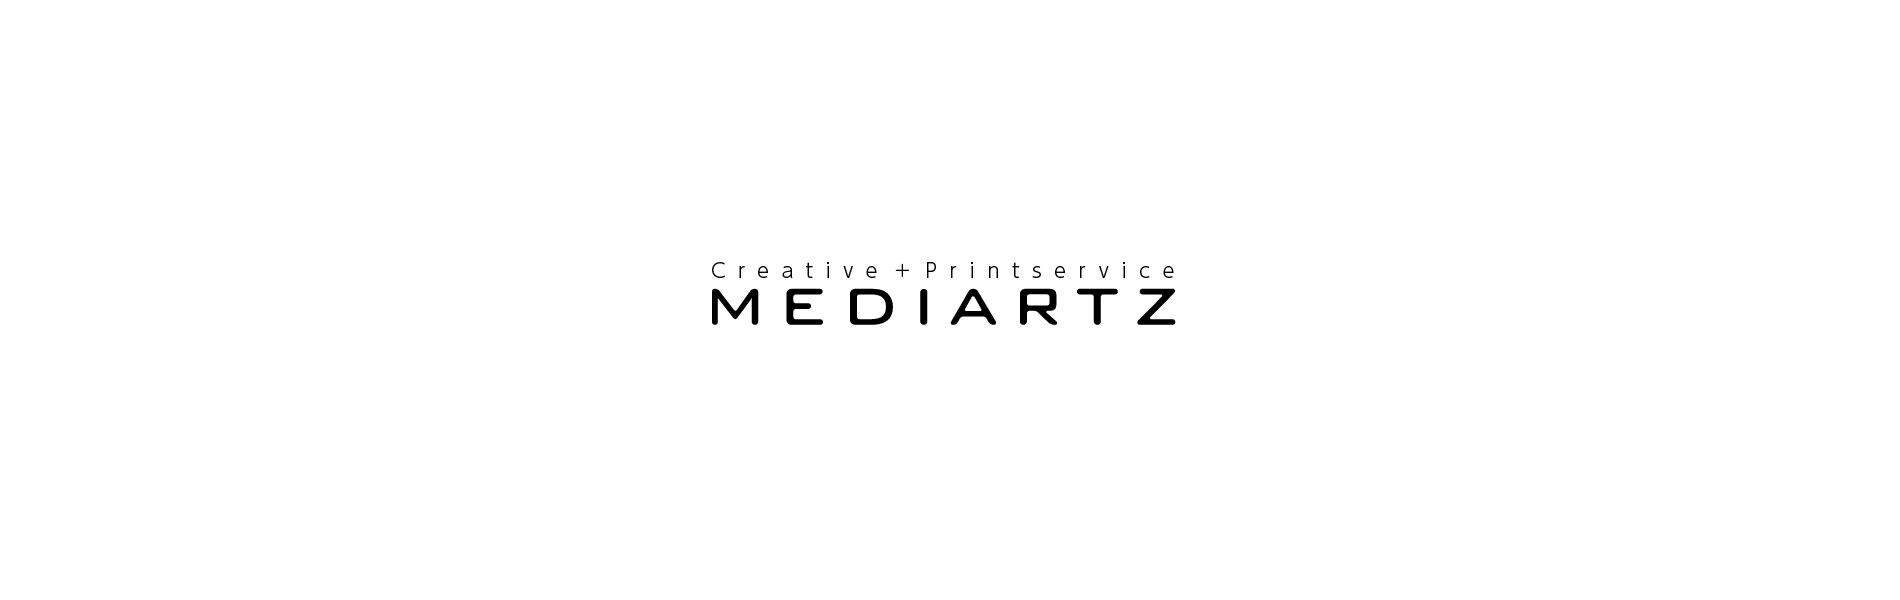 Creative × Printservice mediartz